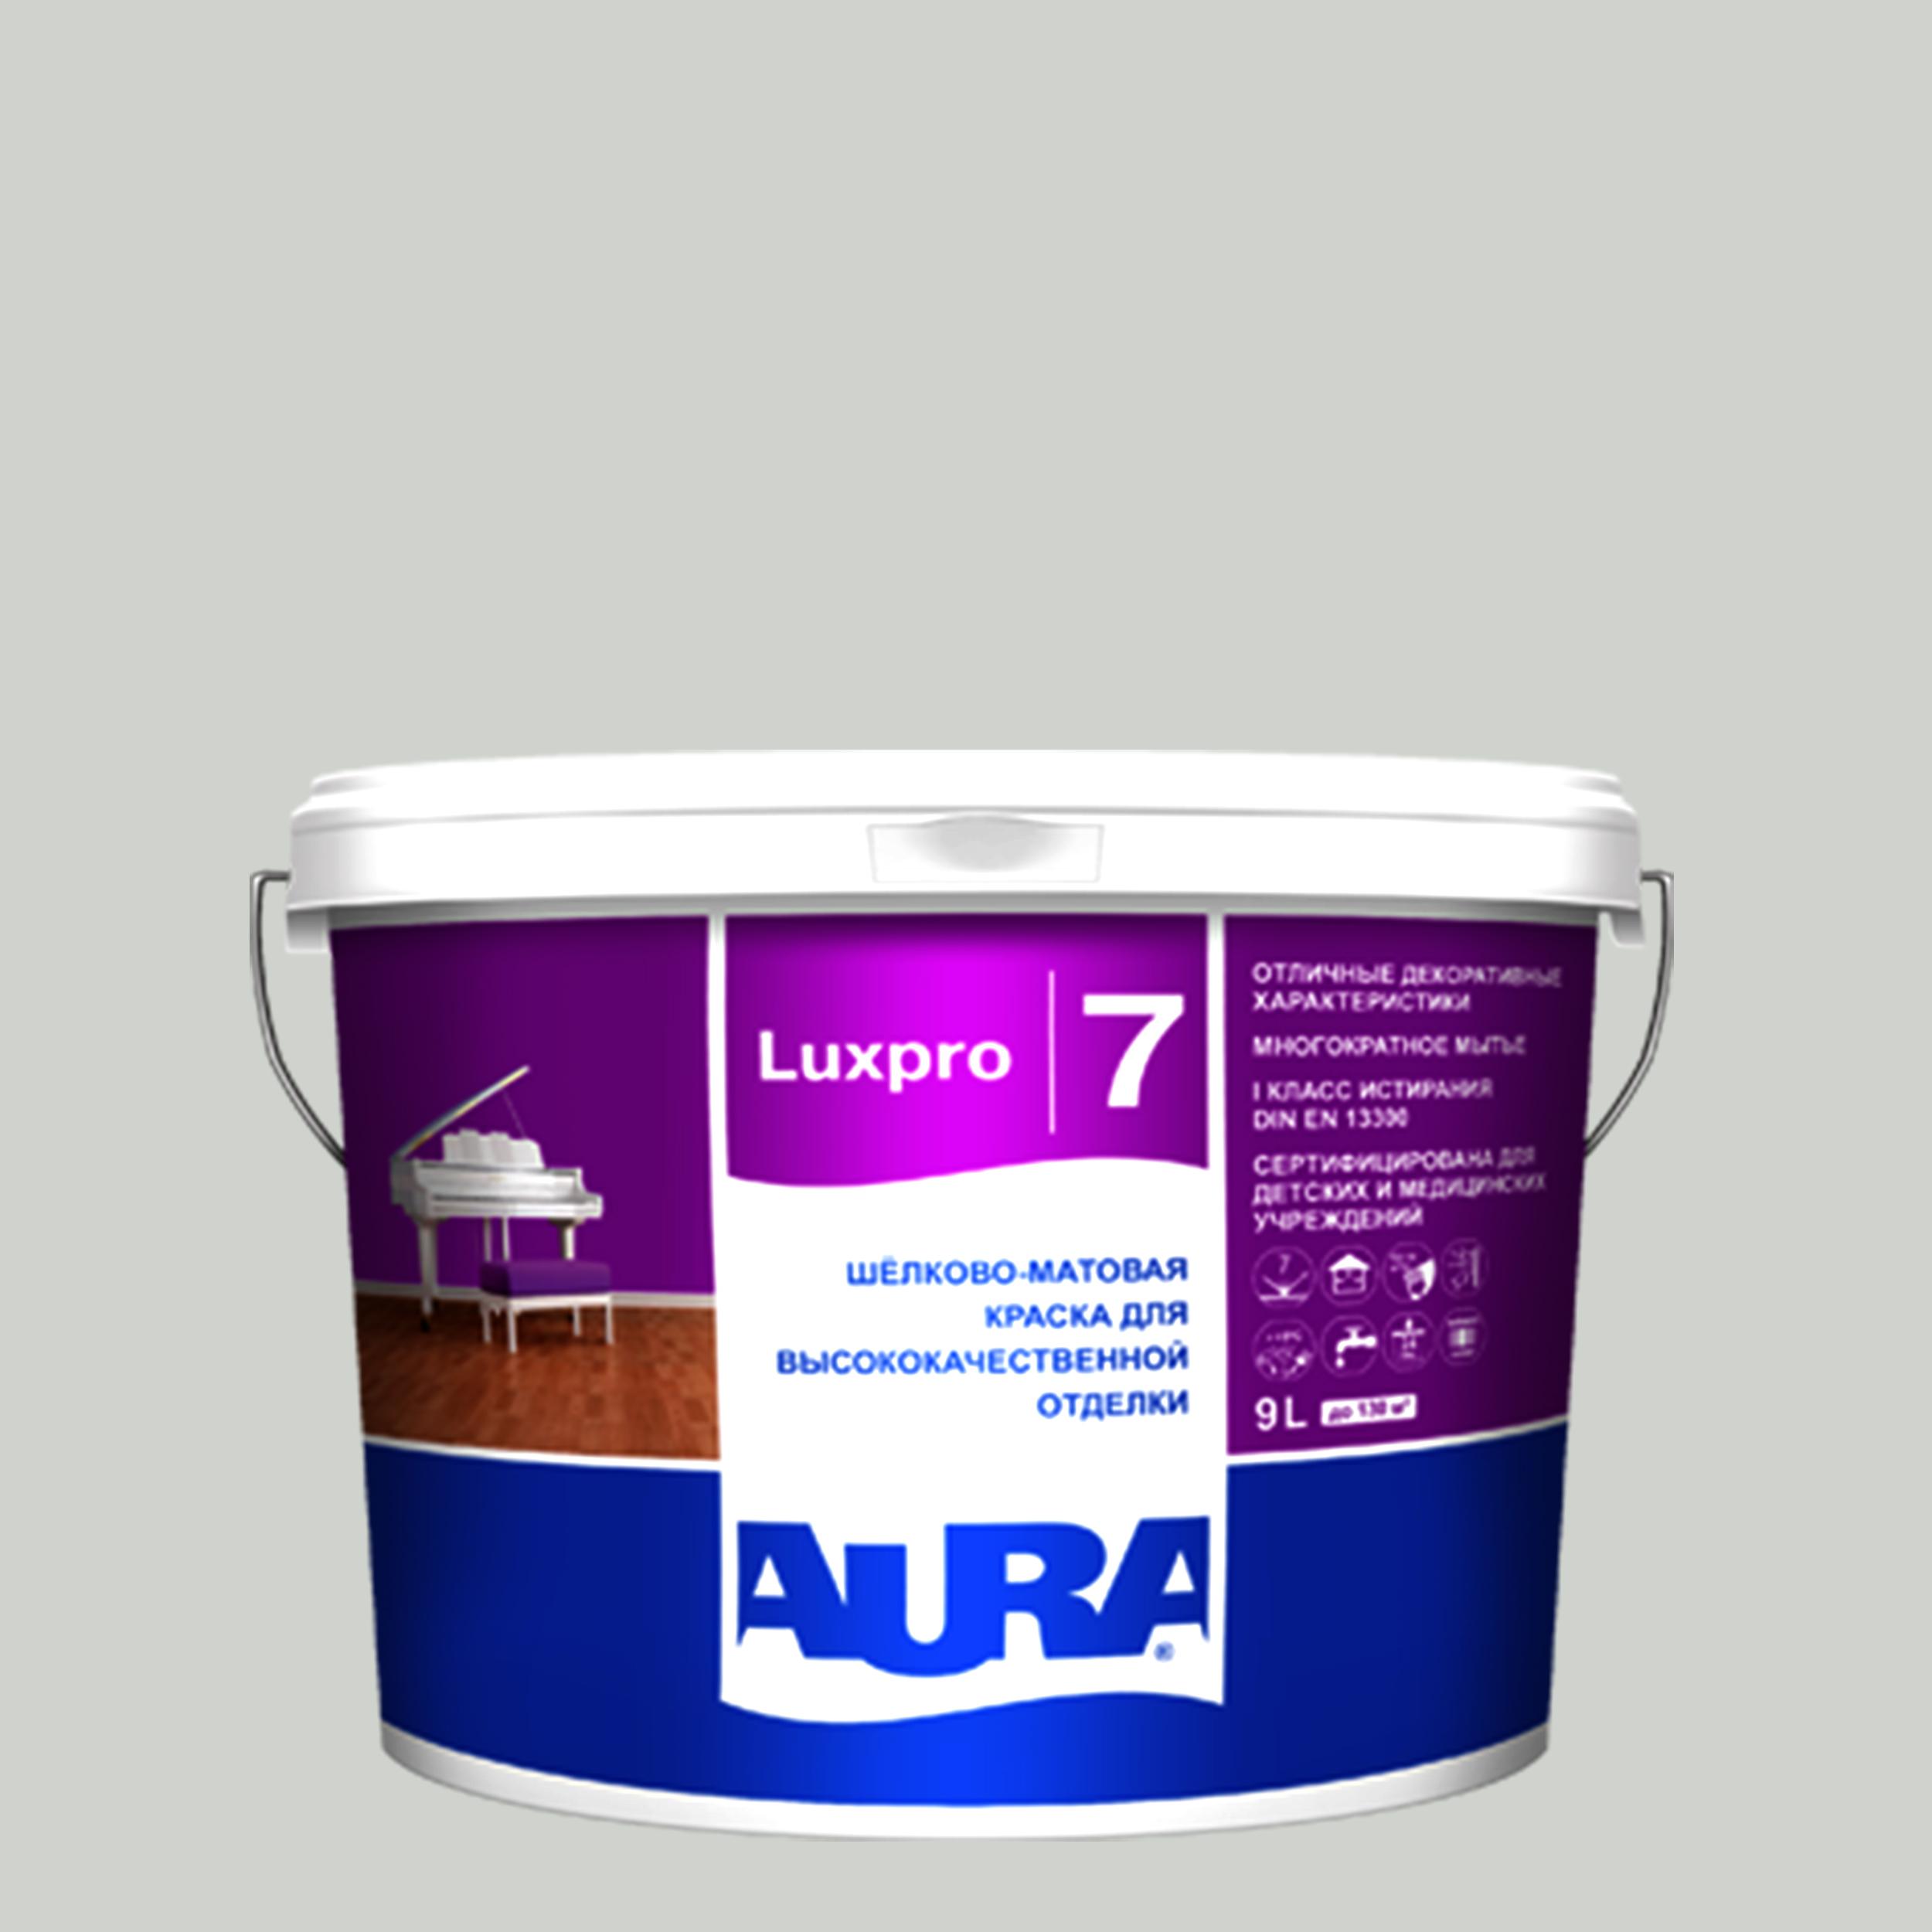 Фото 5 - Краска интерьерная, Aura LuxPRO 7, RAL 4003, 11 кг.